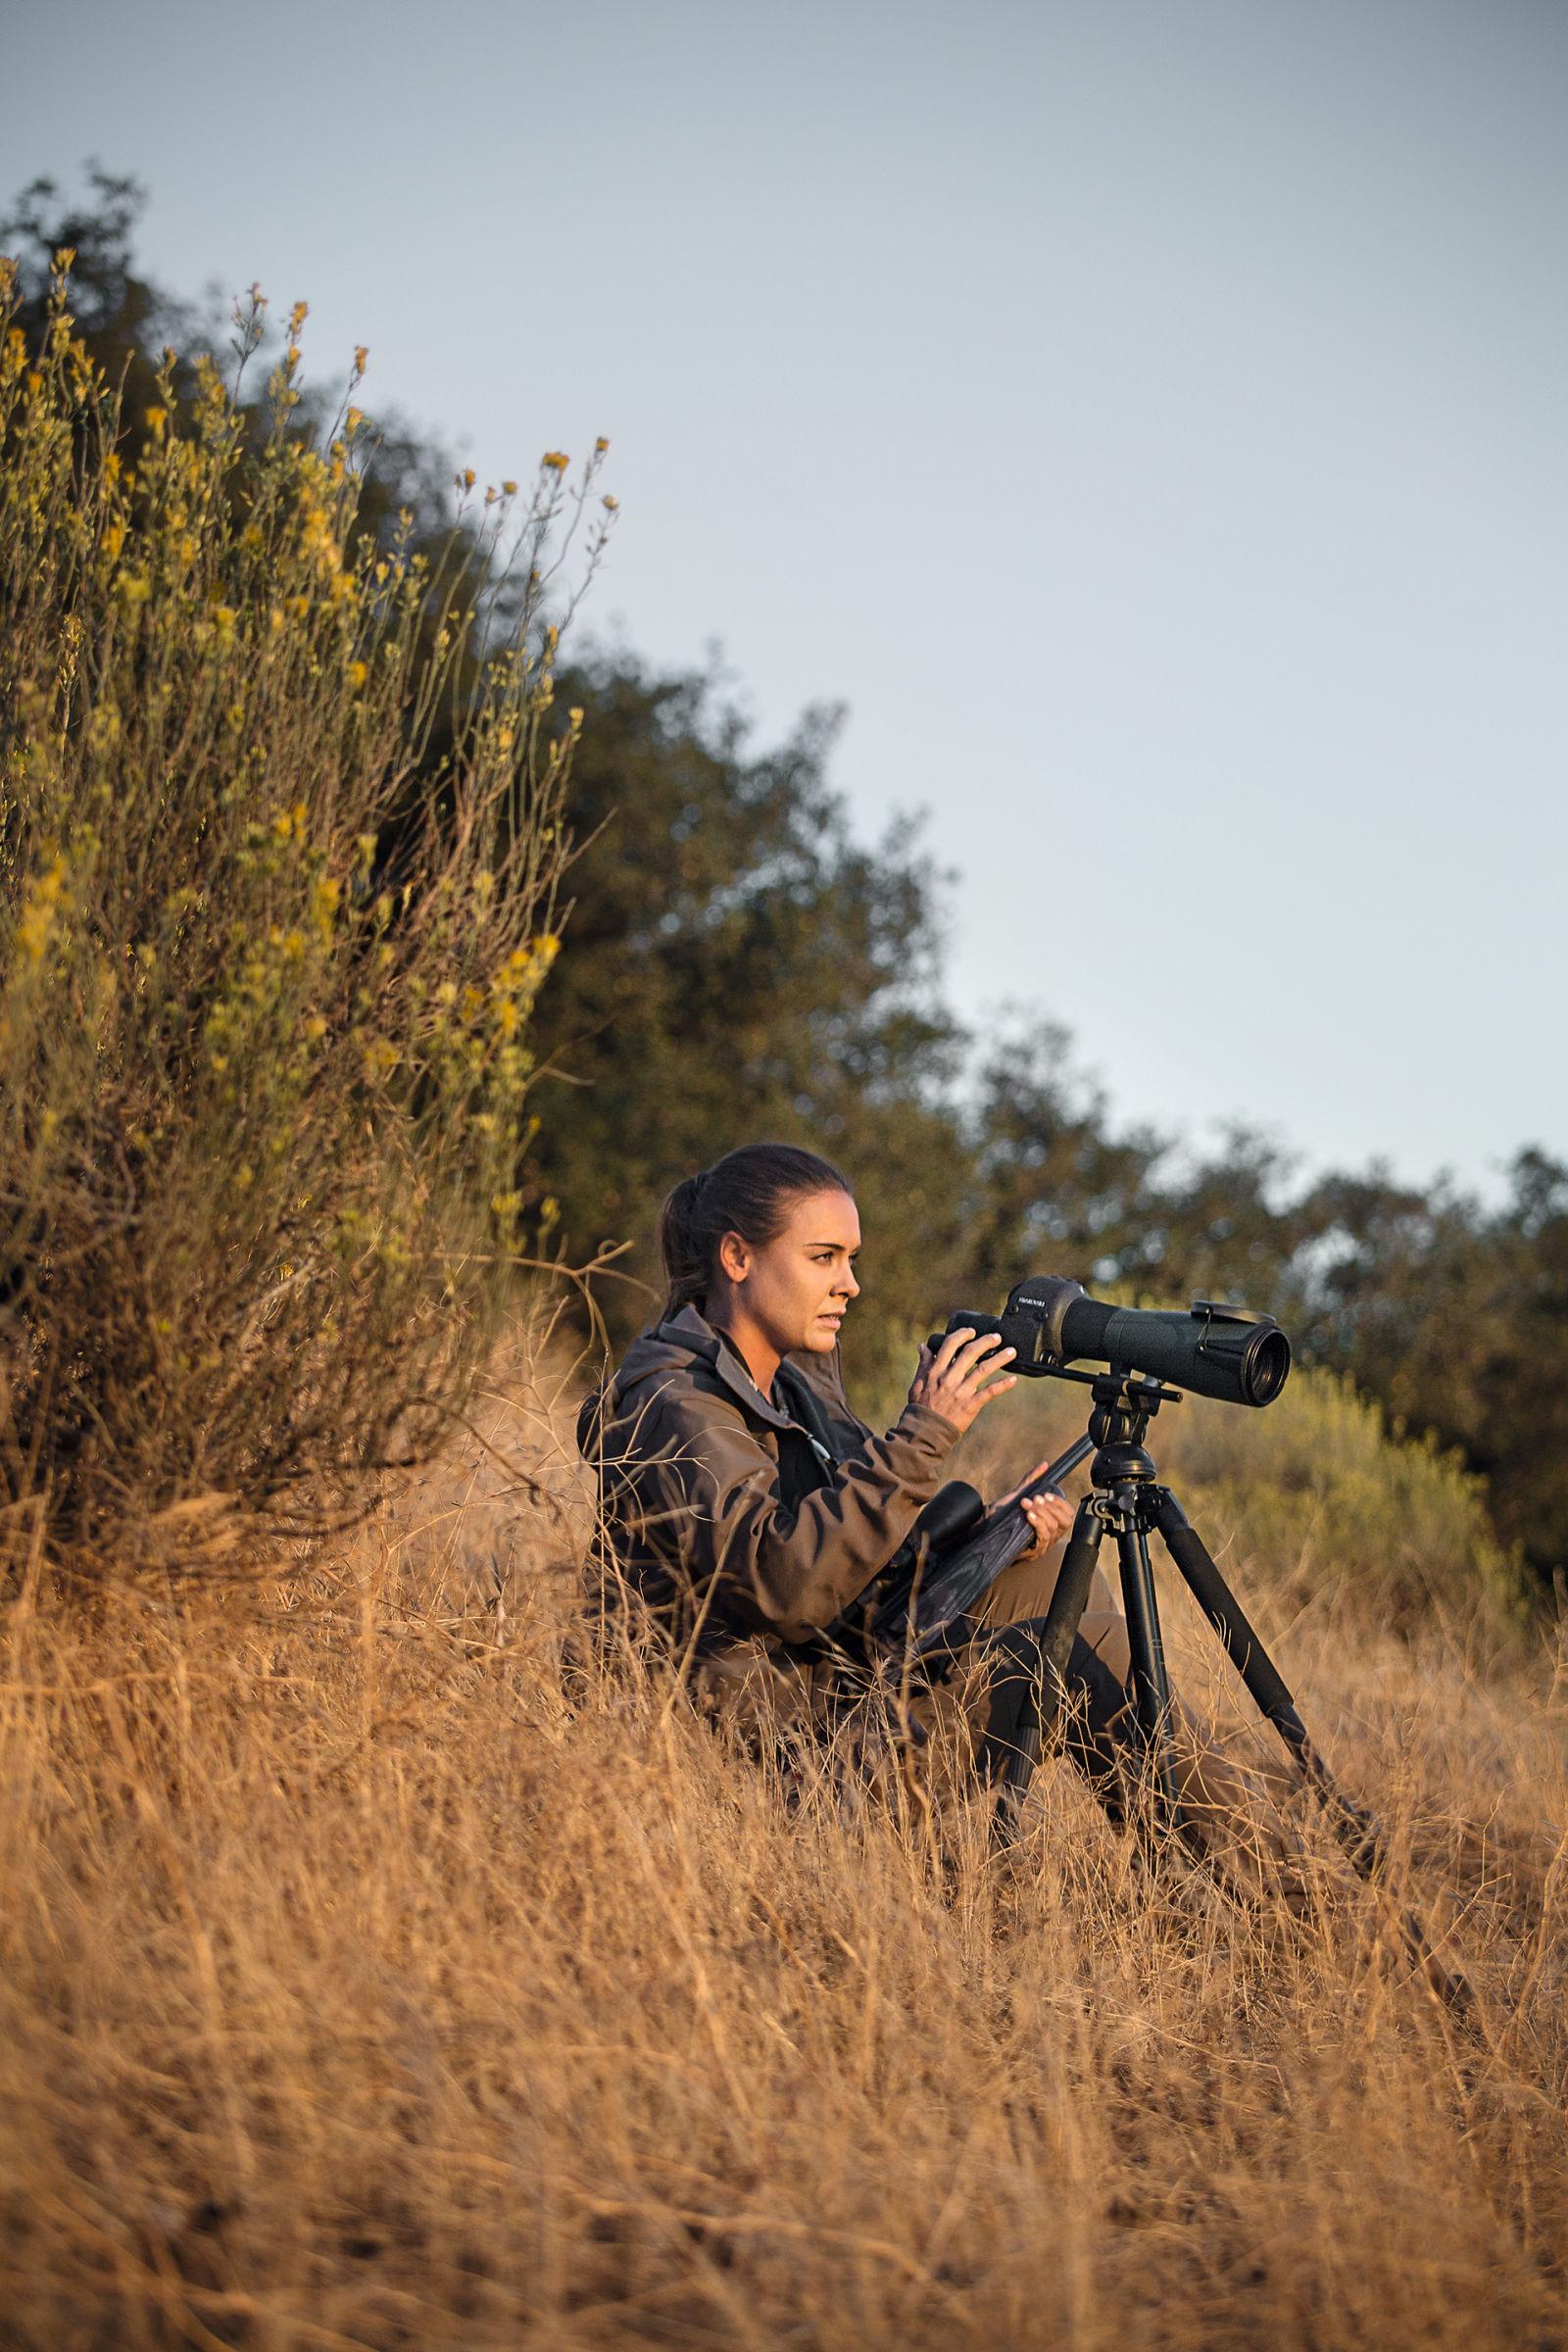 Huntress, using the STR 80 spotting scope.